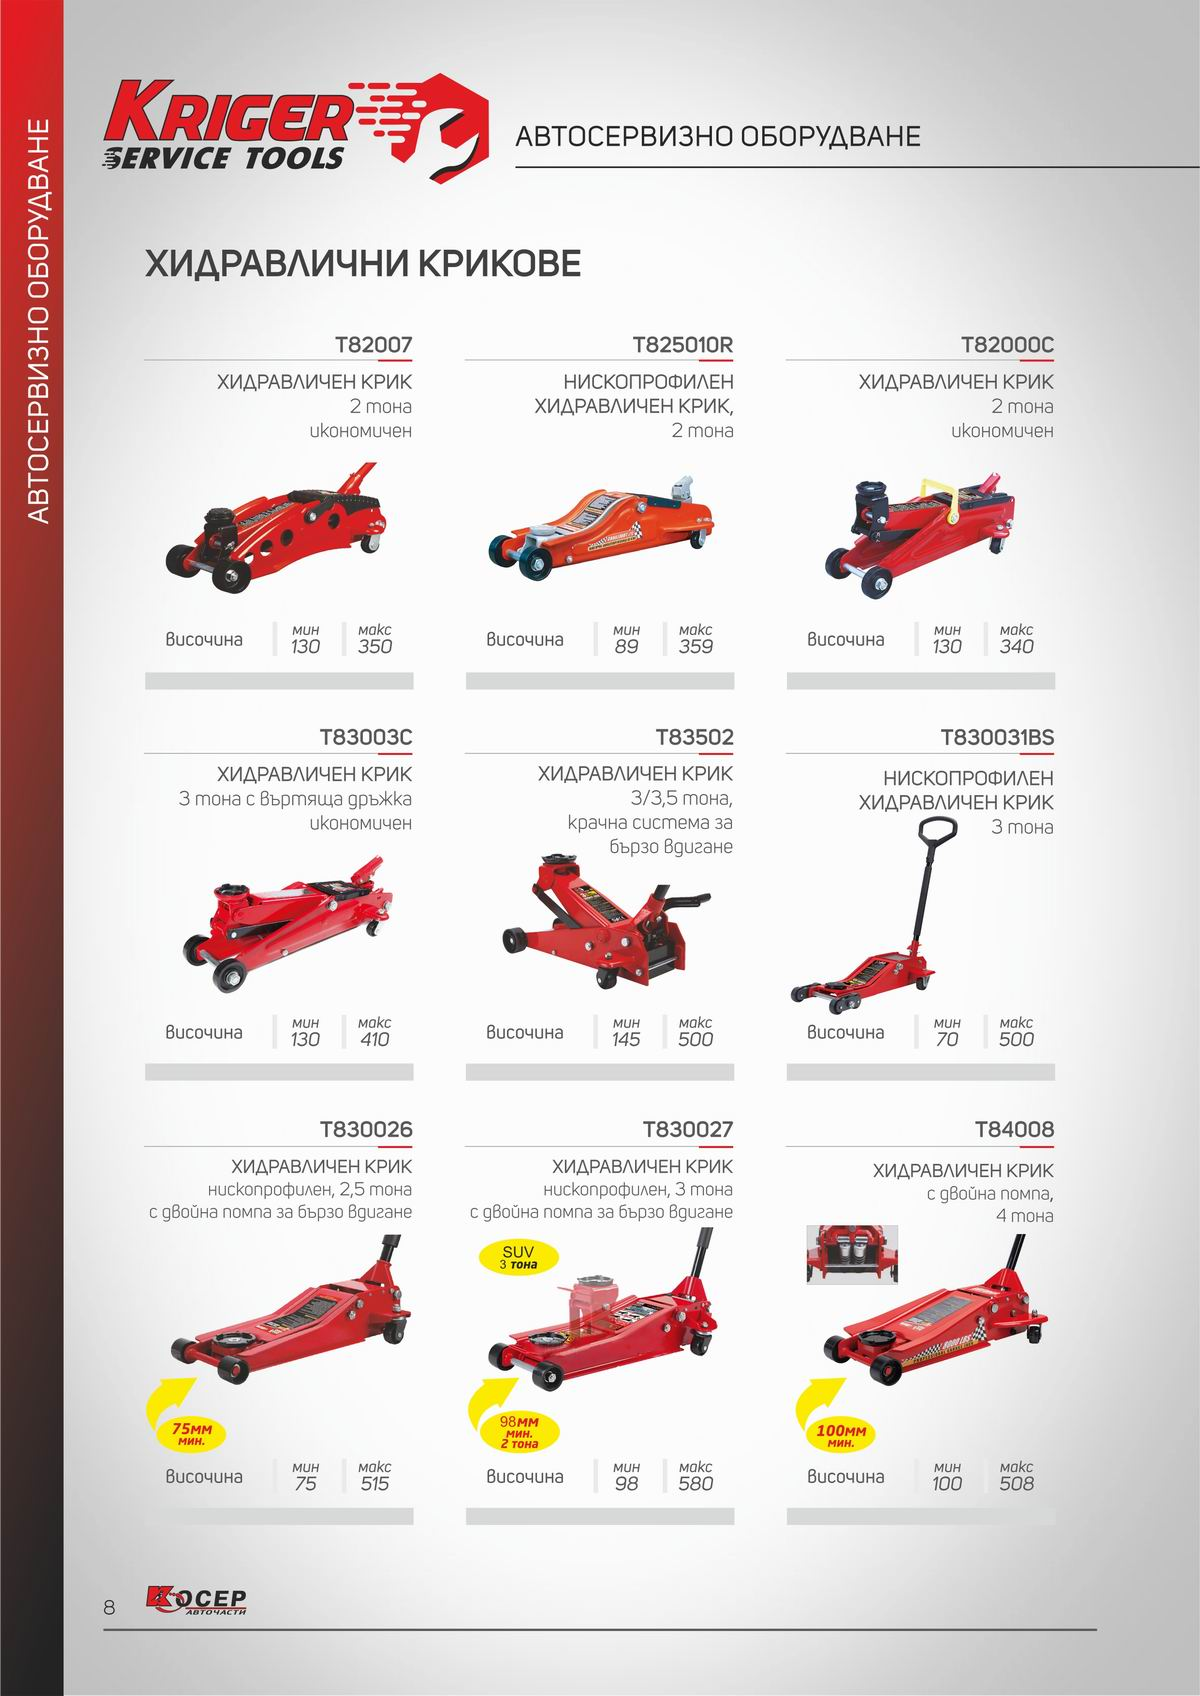 KRIGER Service Tools